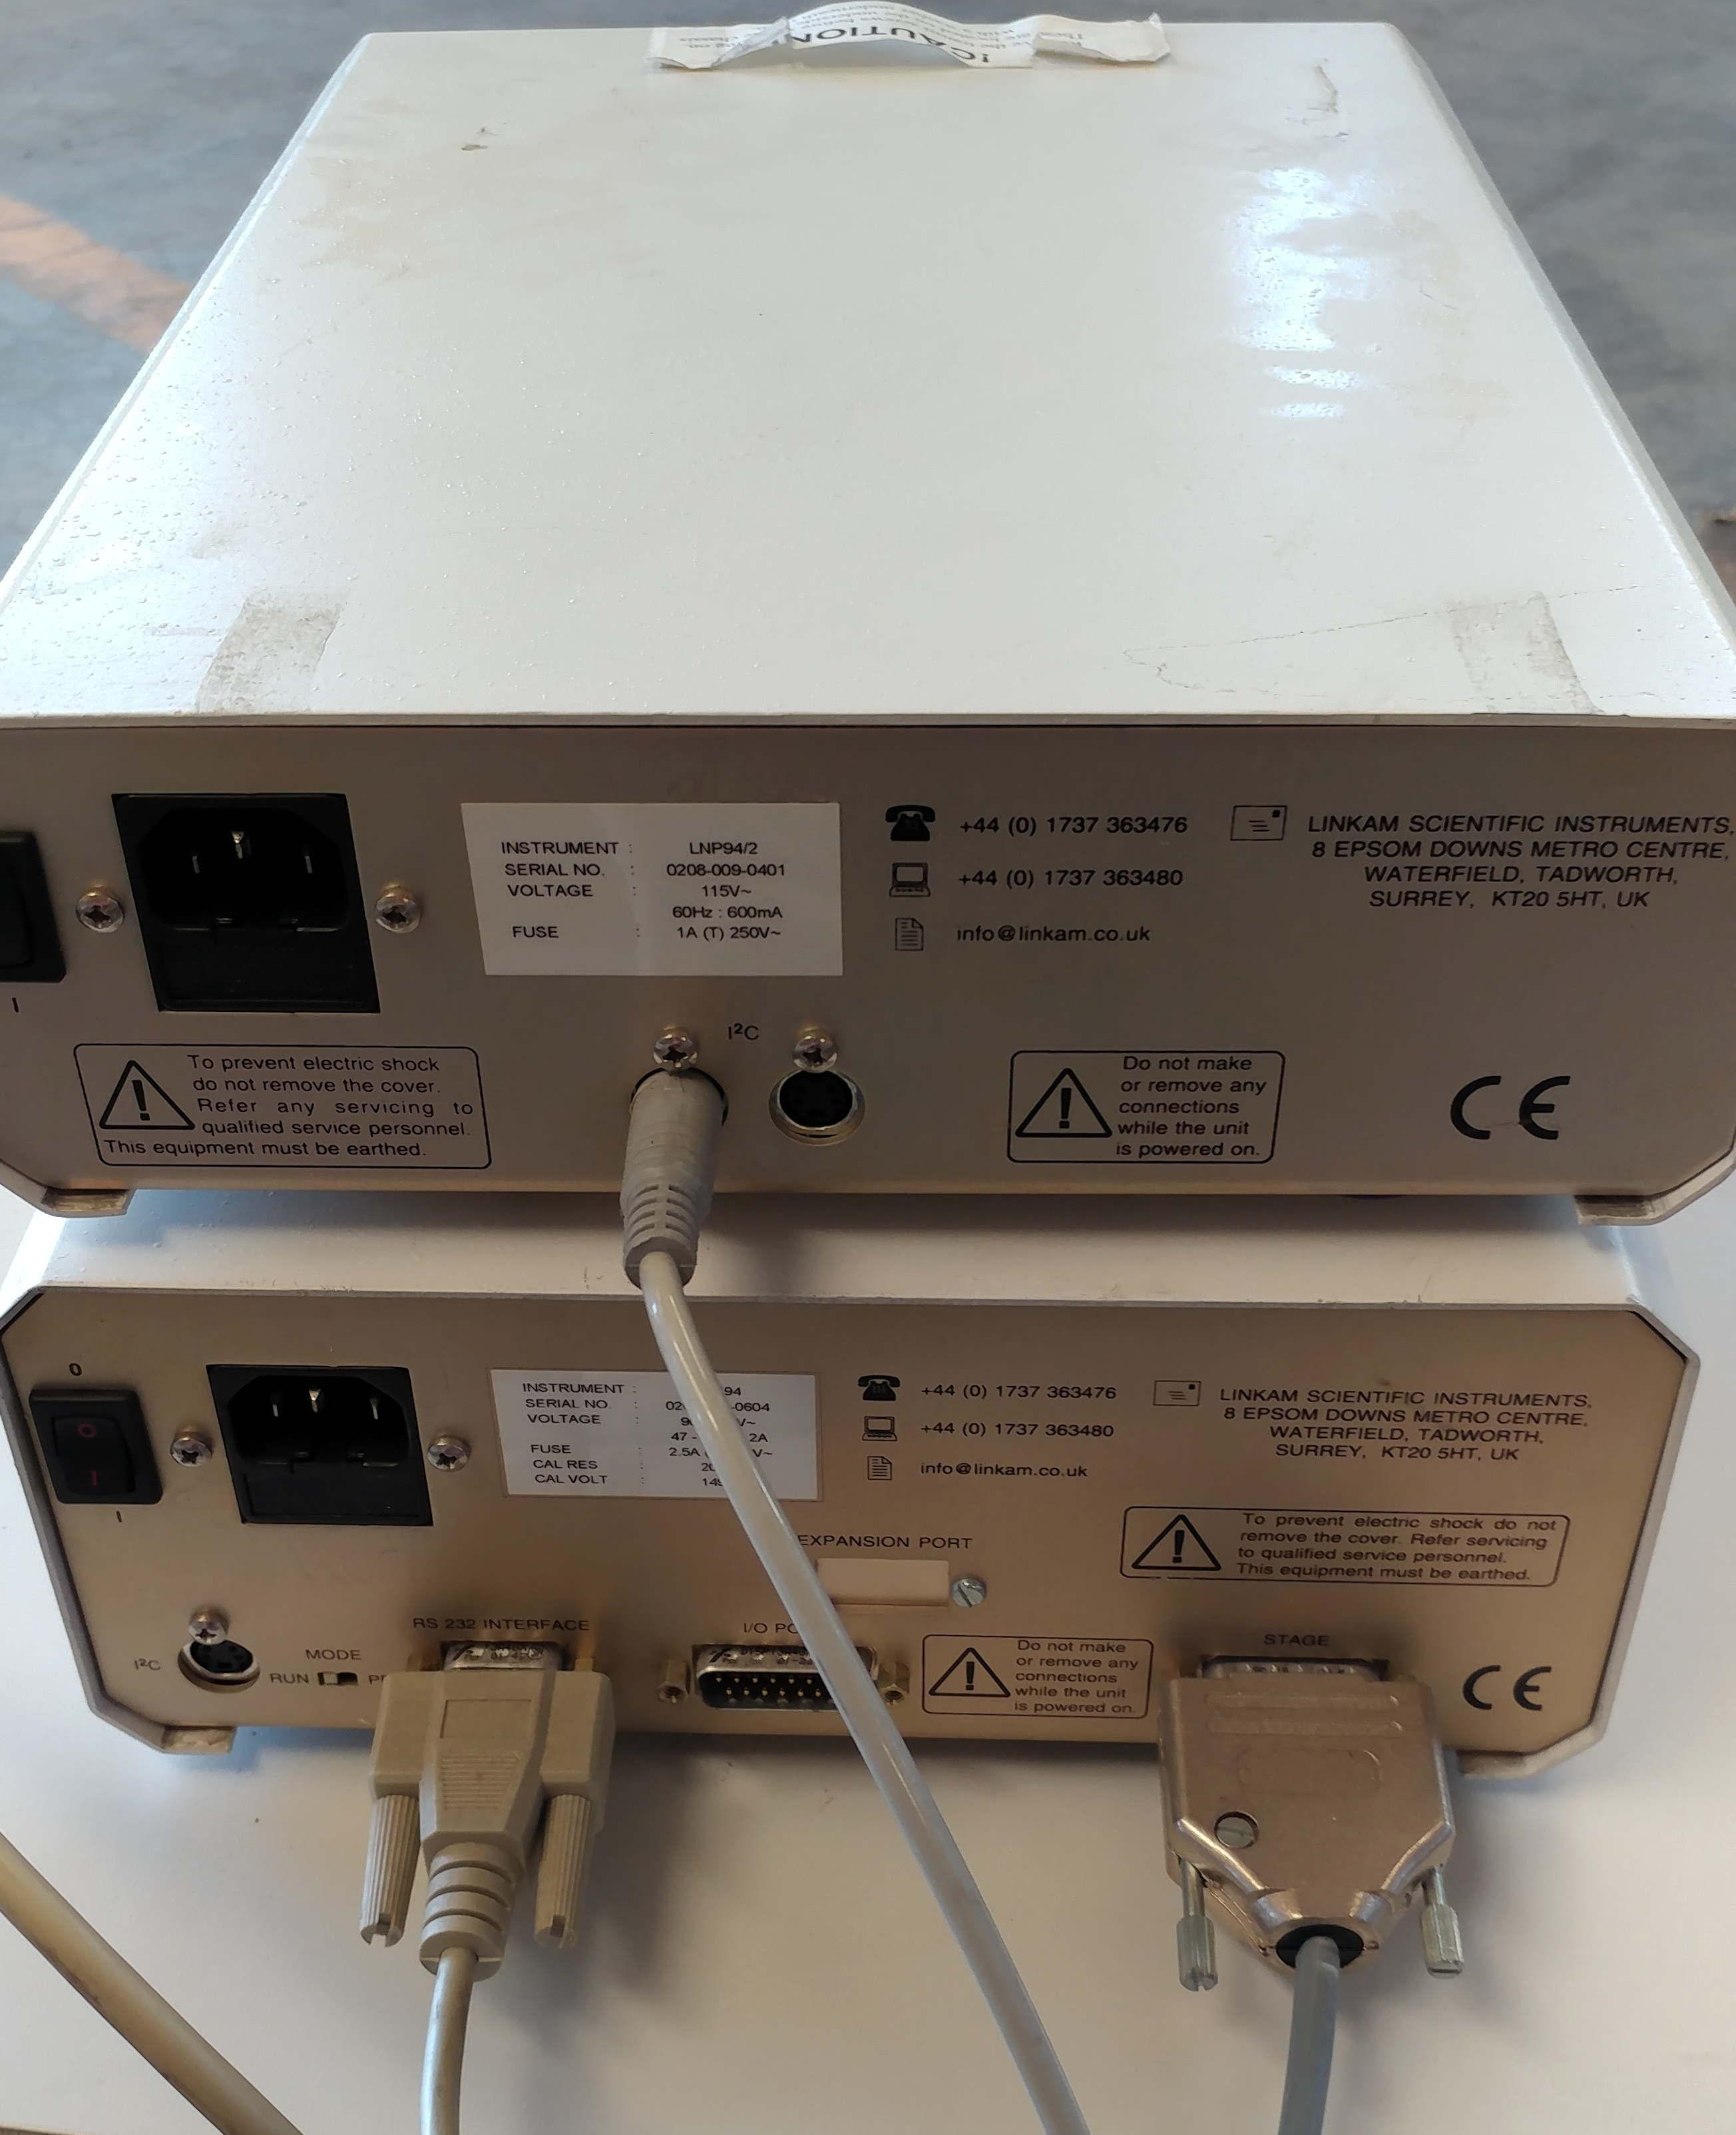 Jobin Yvon Horiba LabRam n 4/59 HR RAMAN Spectrometer- 3 Lasers